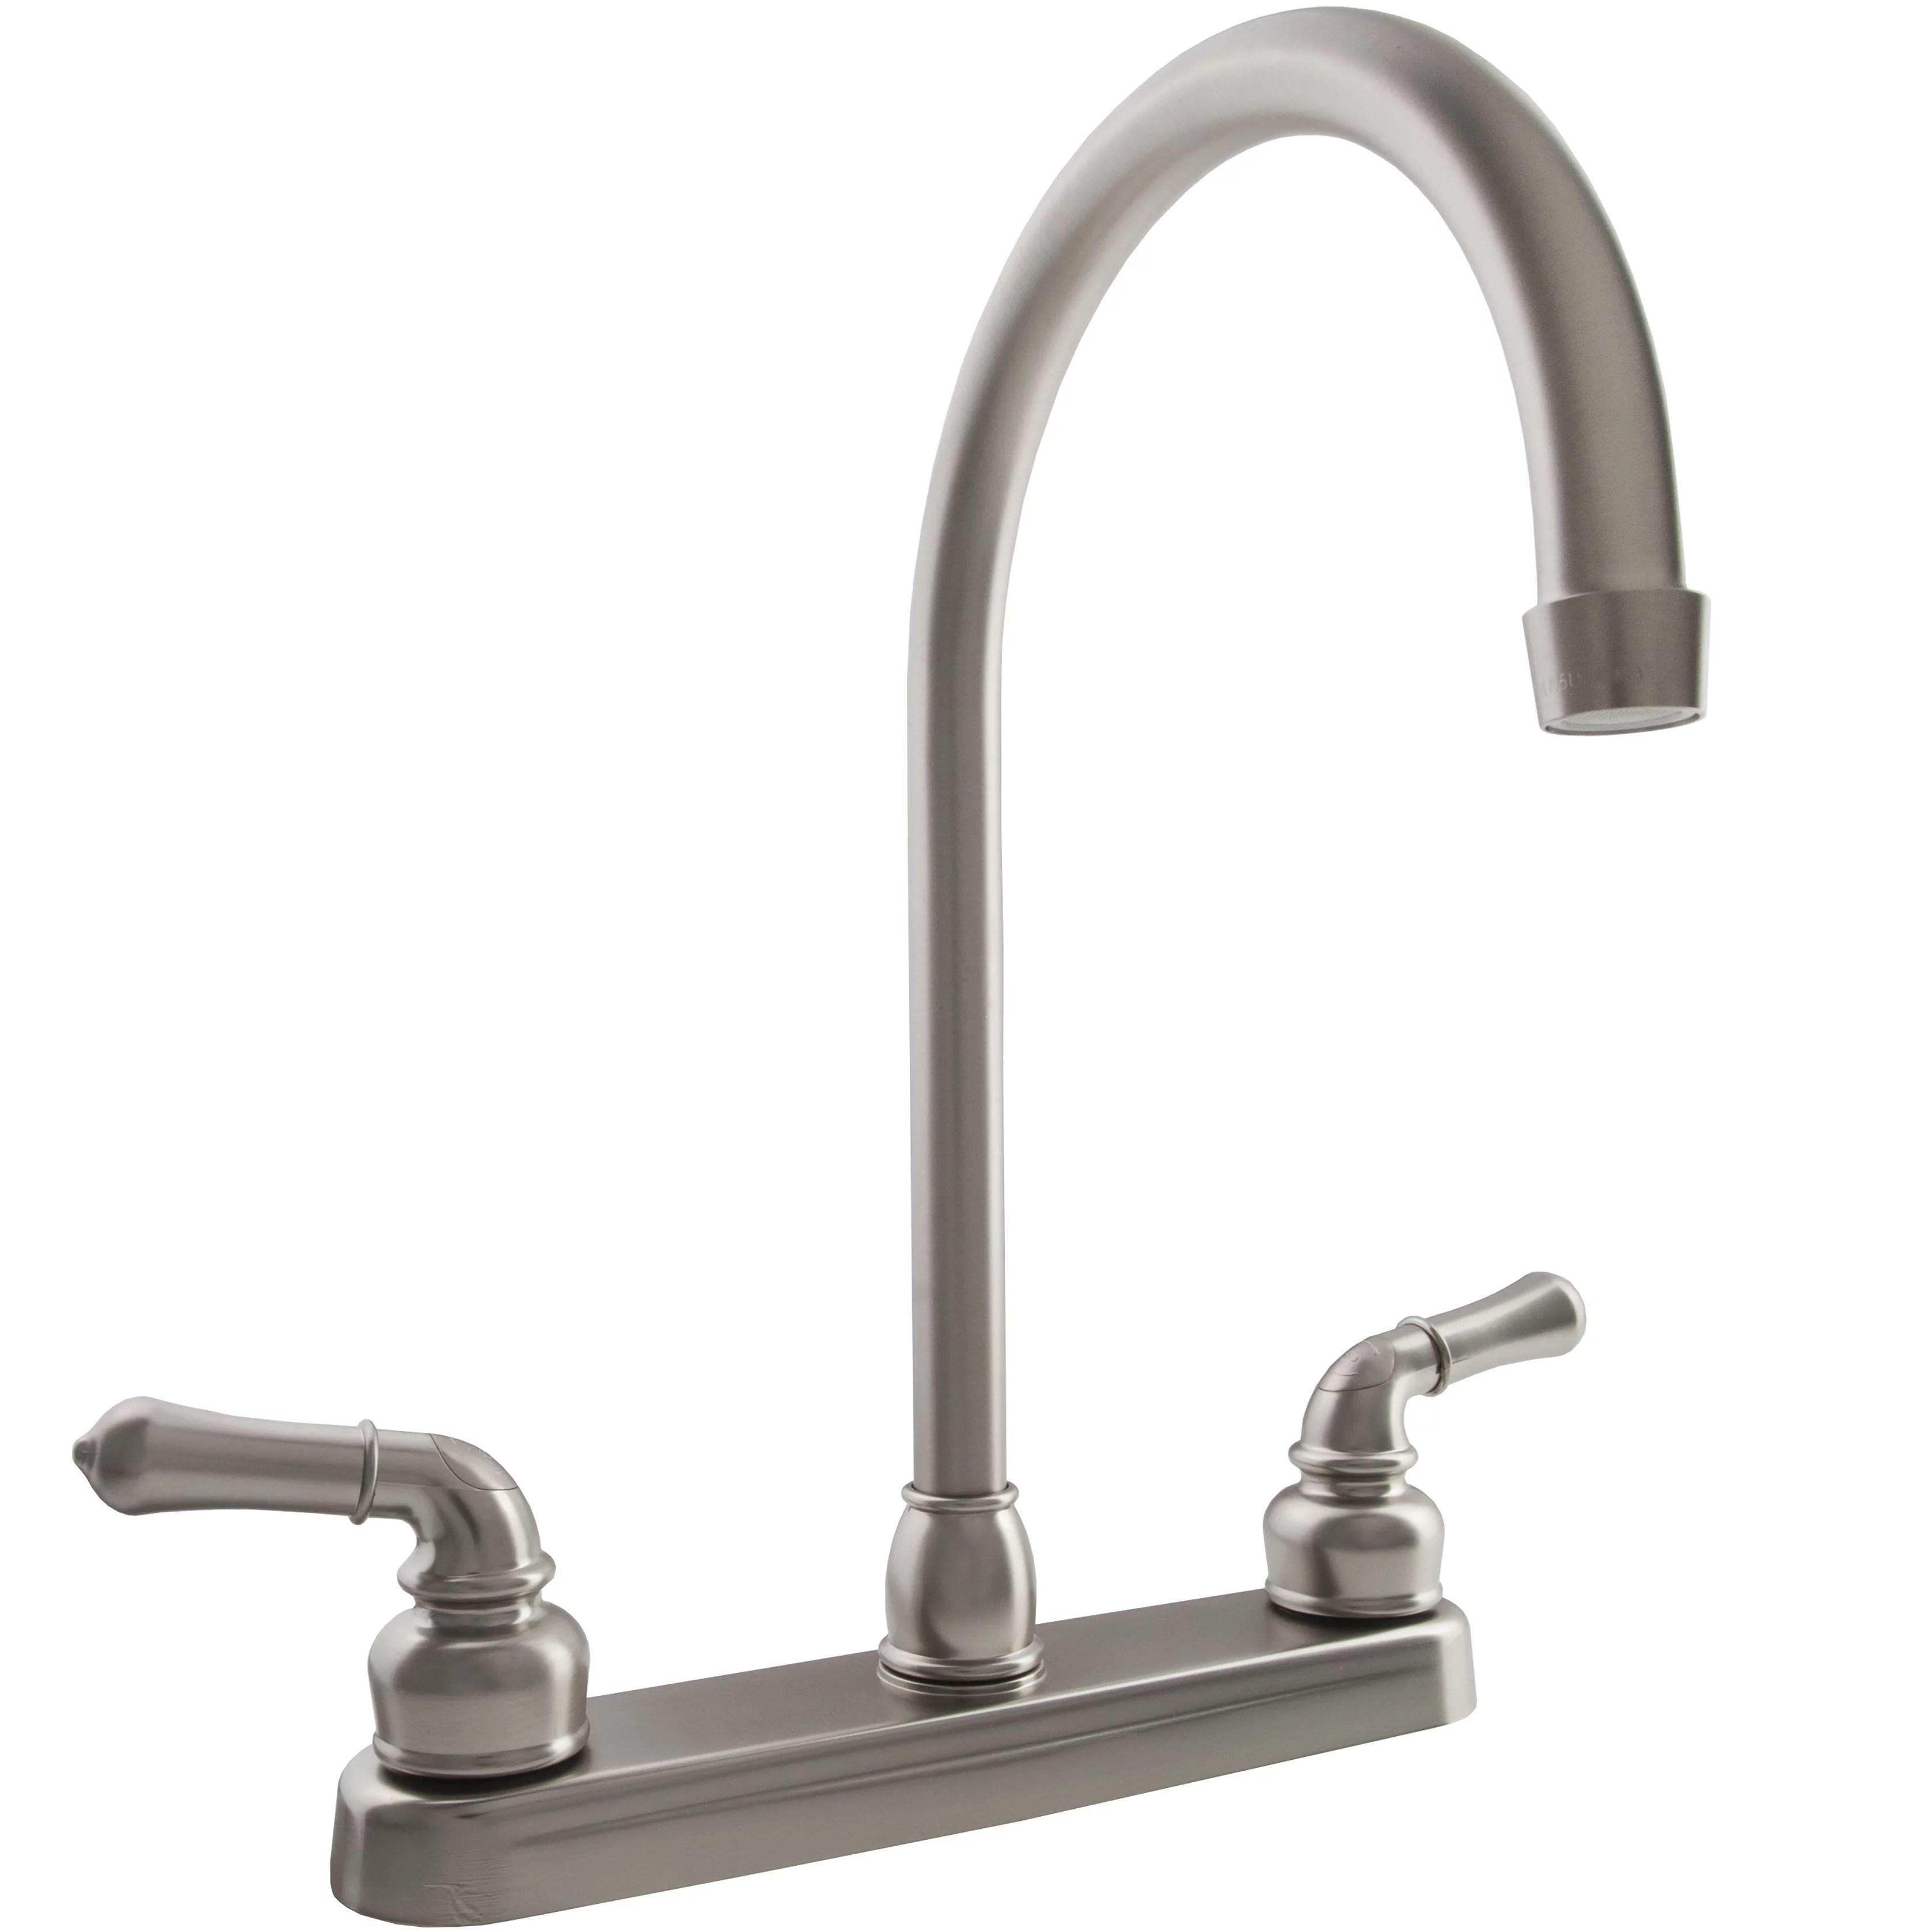 dura faucet j spout rv kitchen faucet brushed satin nickel